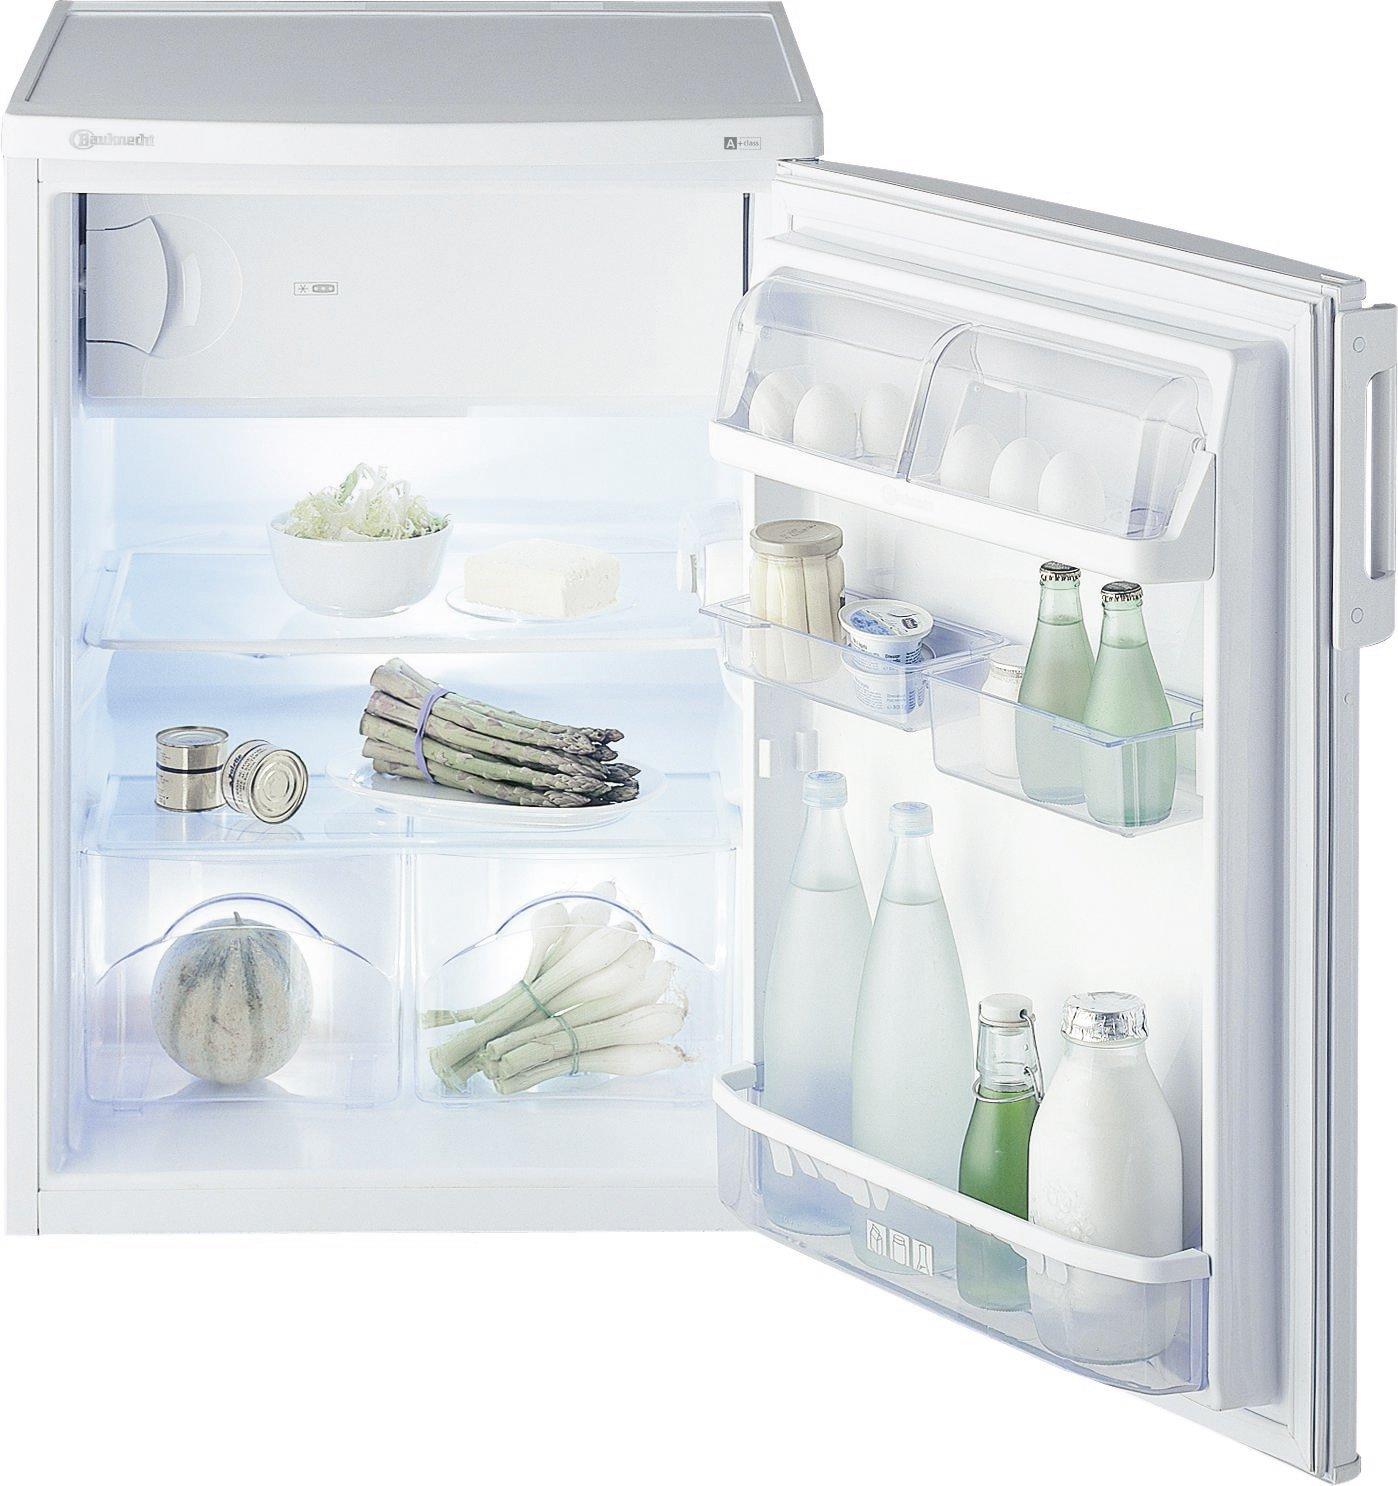 Bauknecht KV 175 Plus Kühlschrank A 139 kWh Jahr Kühlen